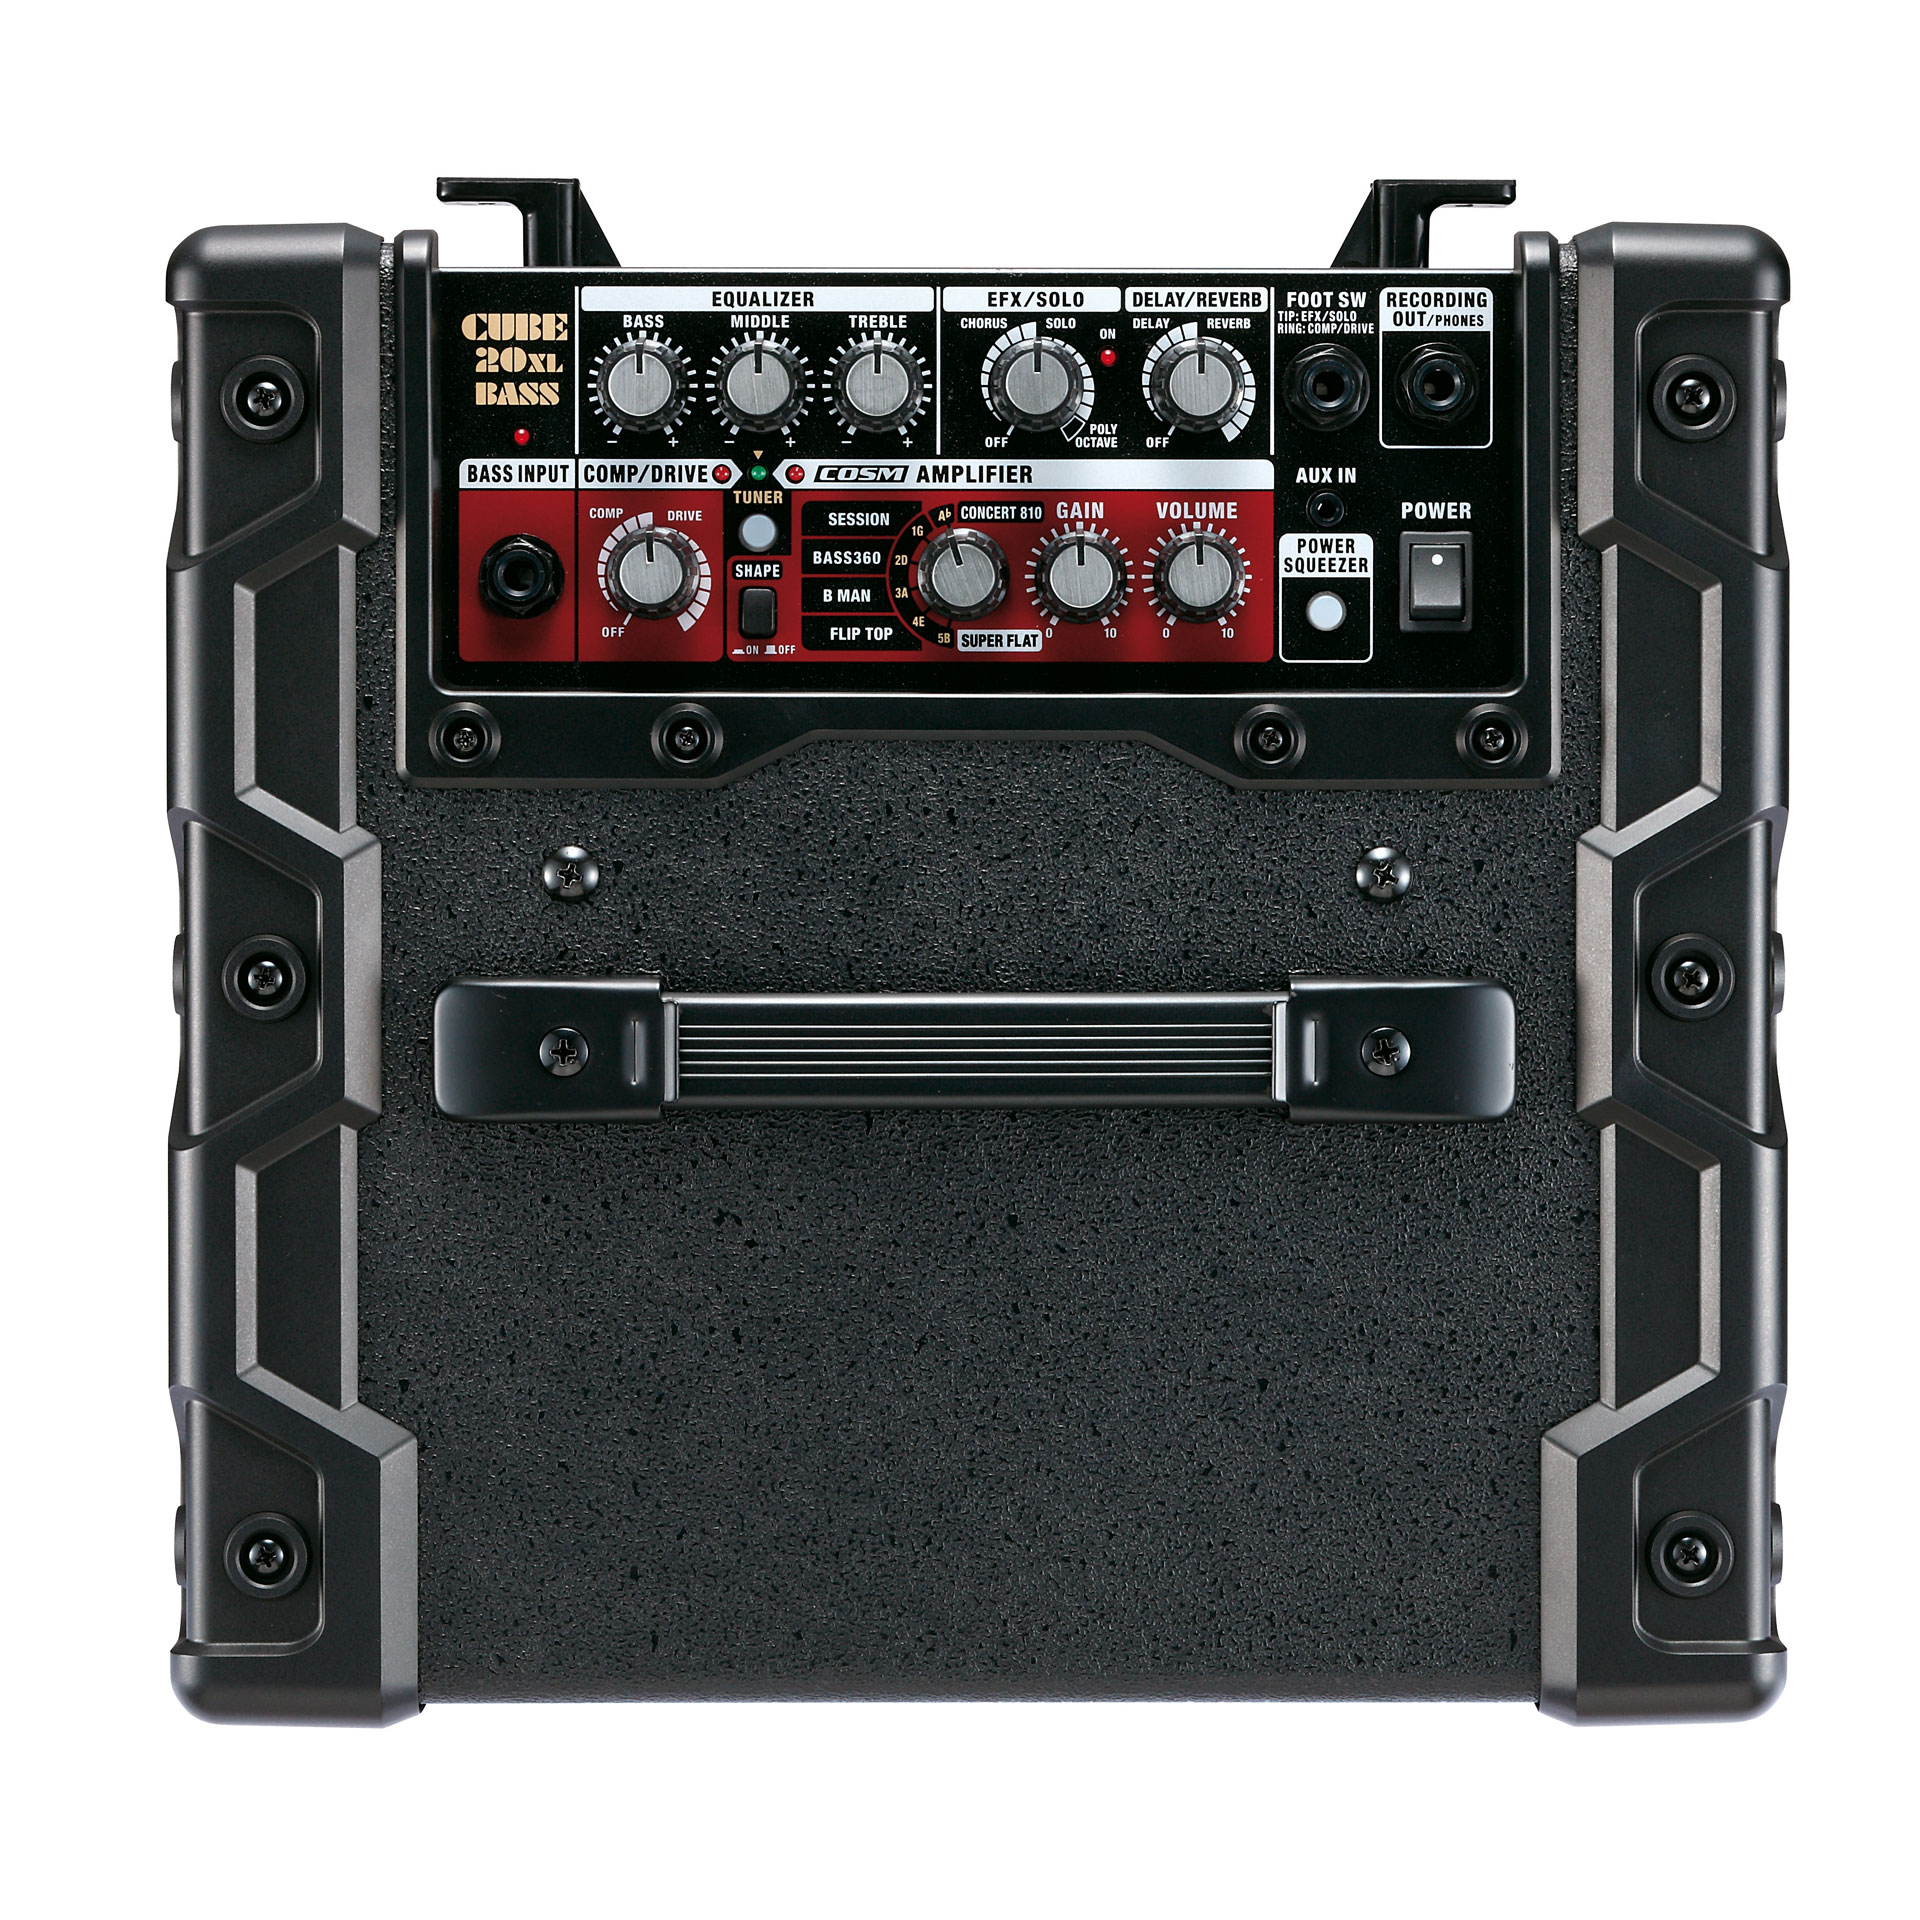 roland cube 20xl 10049722 bass amp. Black Bedroom Furniture Sets. Home Design Ideas